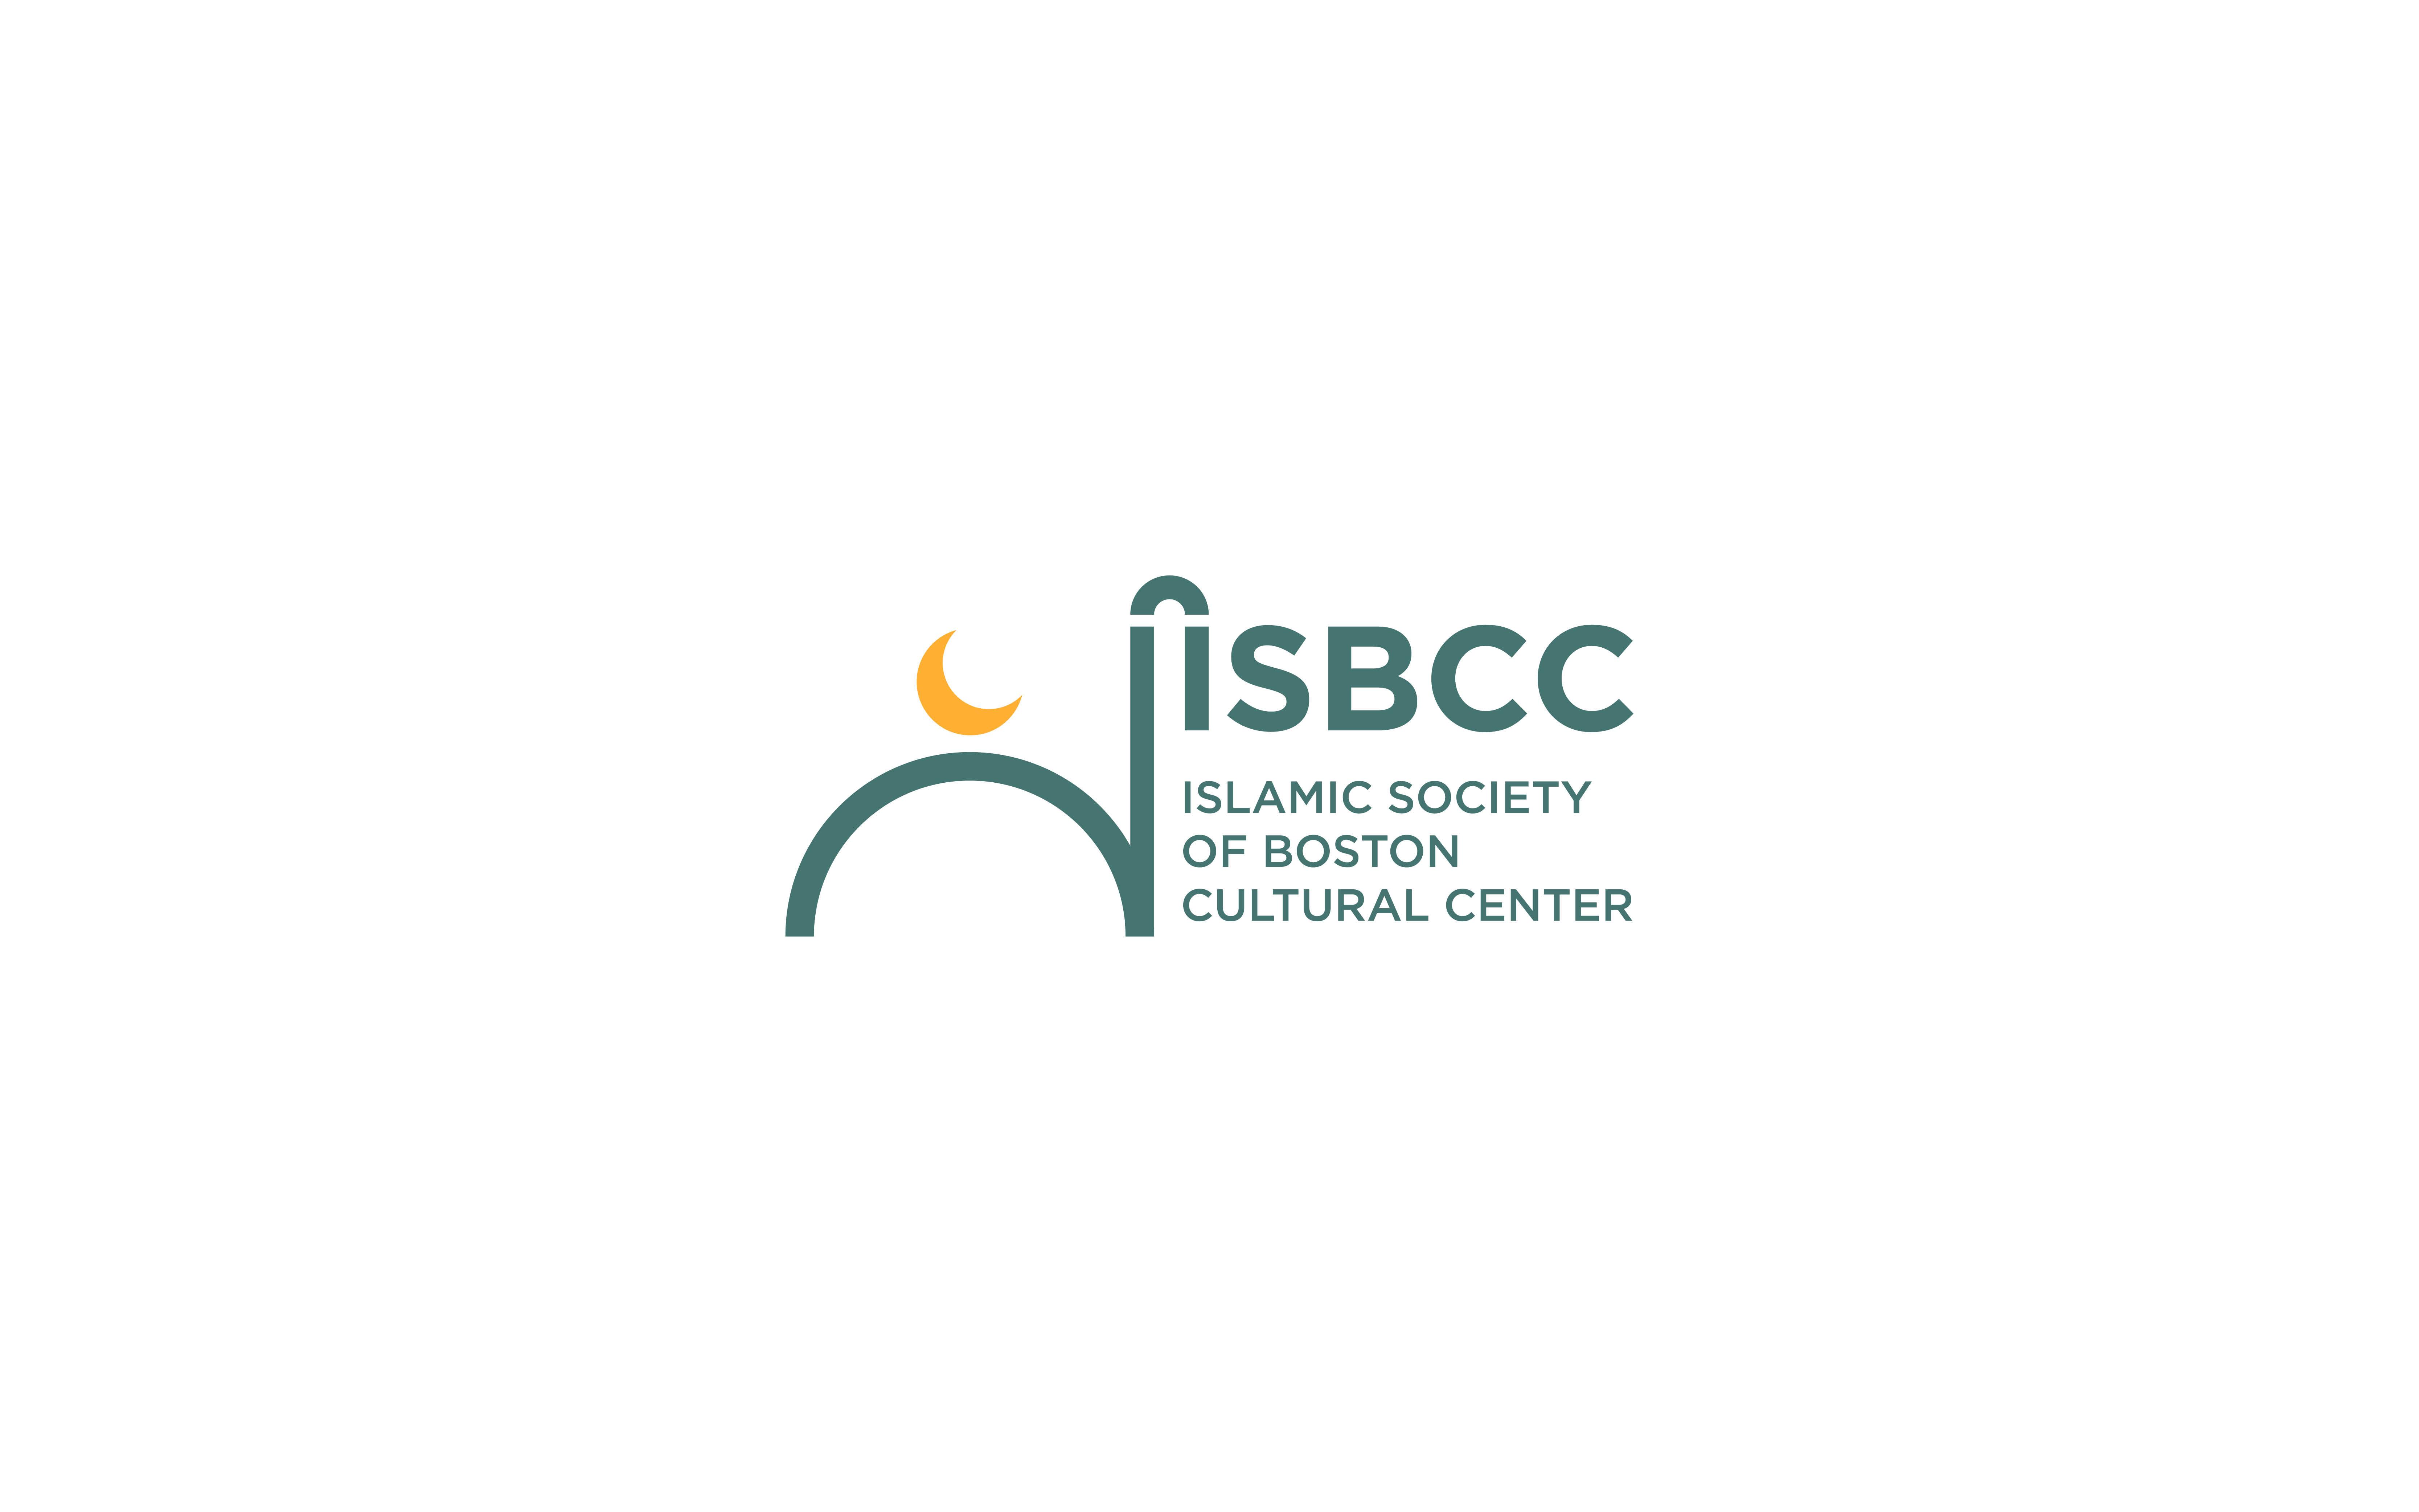 ISBCC_Branding1